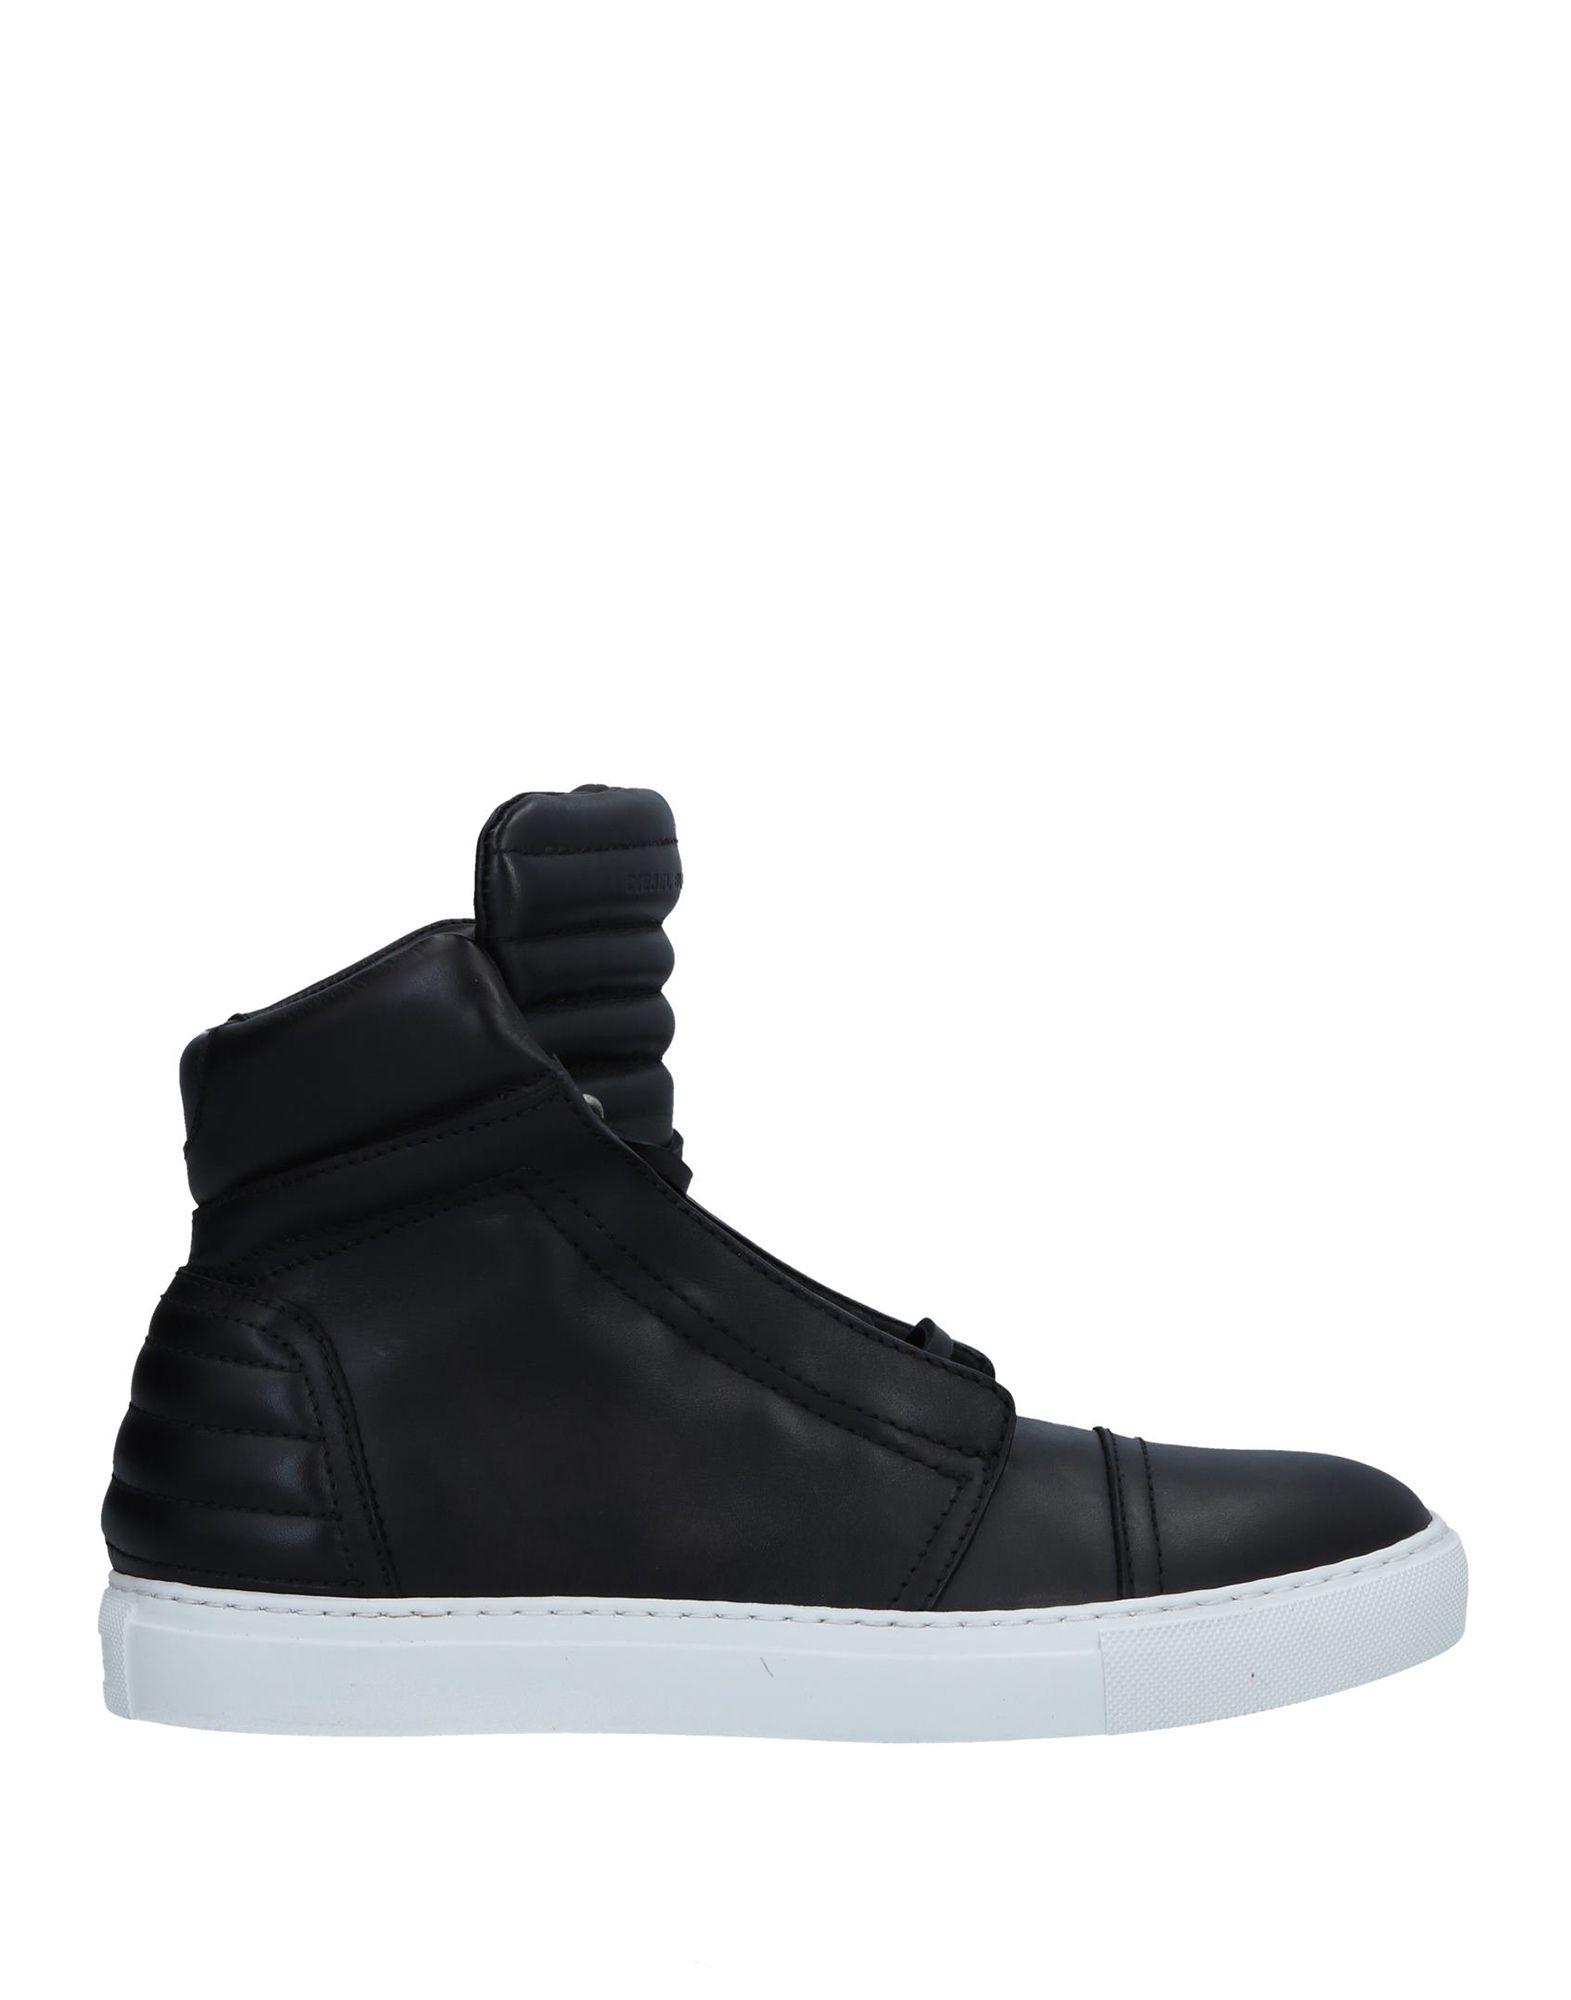 DIESEL BLACK GOLD Высокие кеды и кроссовки кеды кроссовки высокие детские dc rebound se black blue